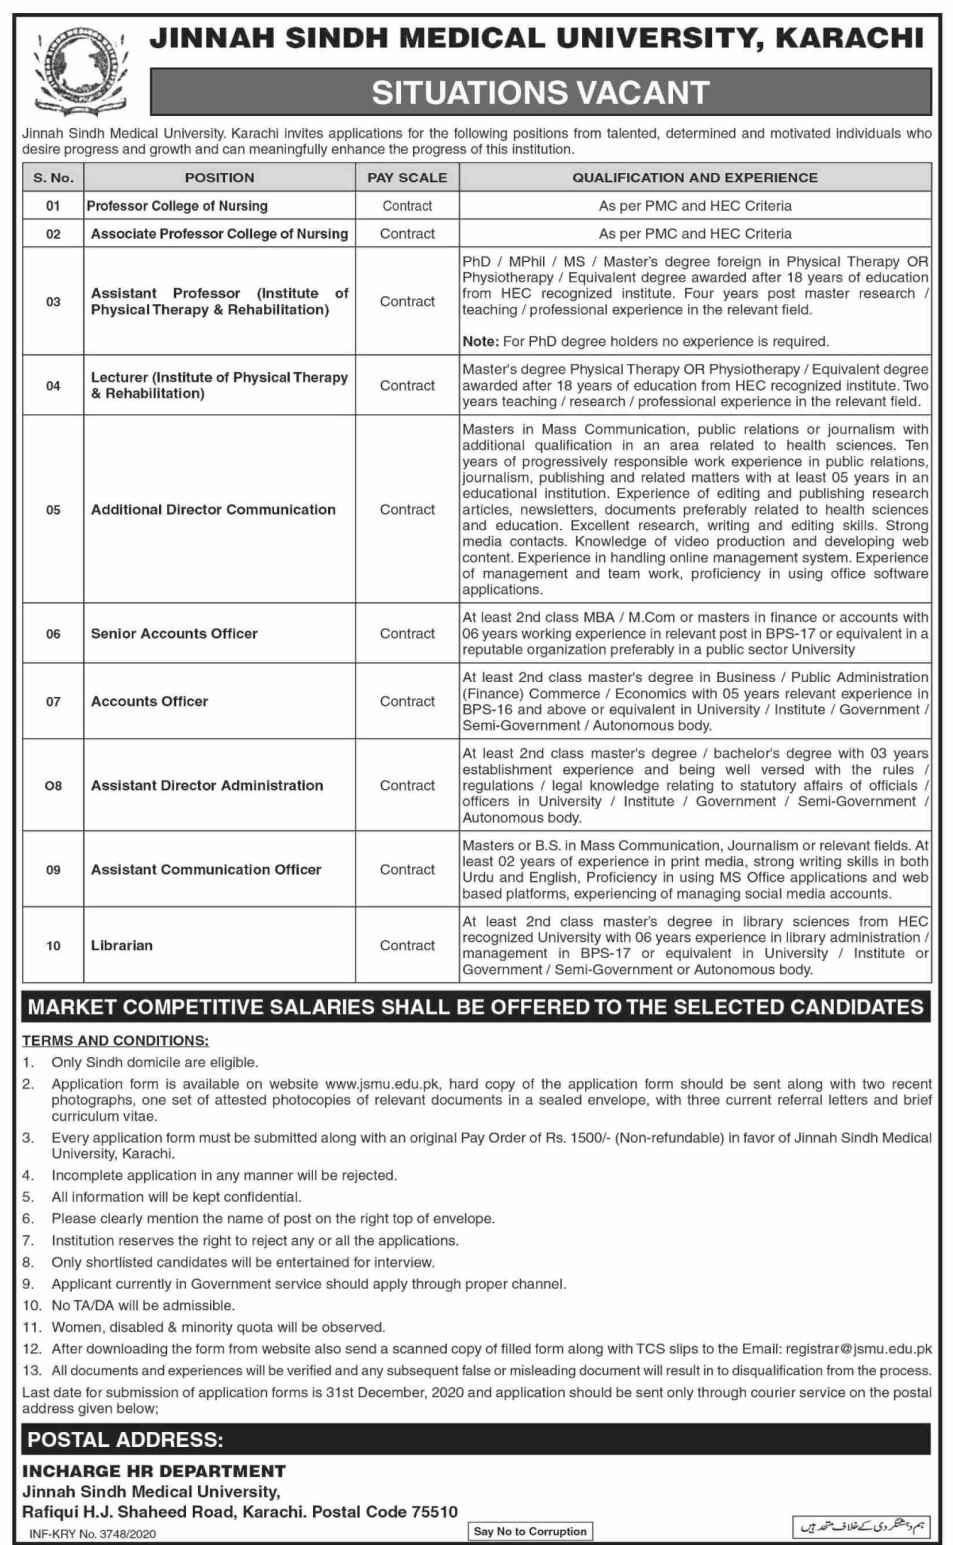 Jinnah Sindh Medical University JSMU Karachi Jobs 2021 Assistant Communication Officer, Librarian, Professor Nursing and more